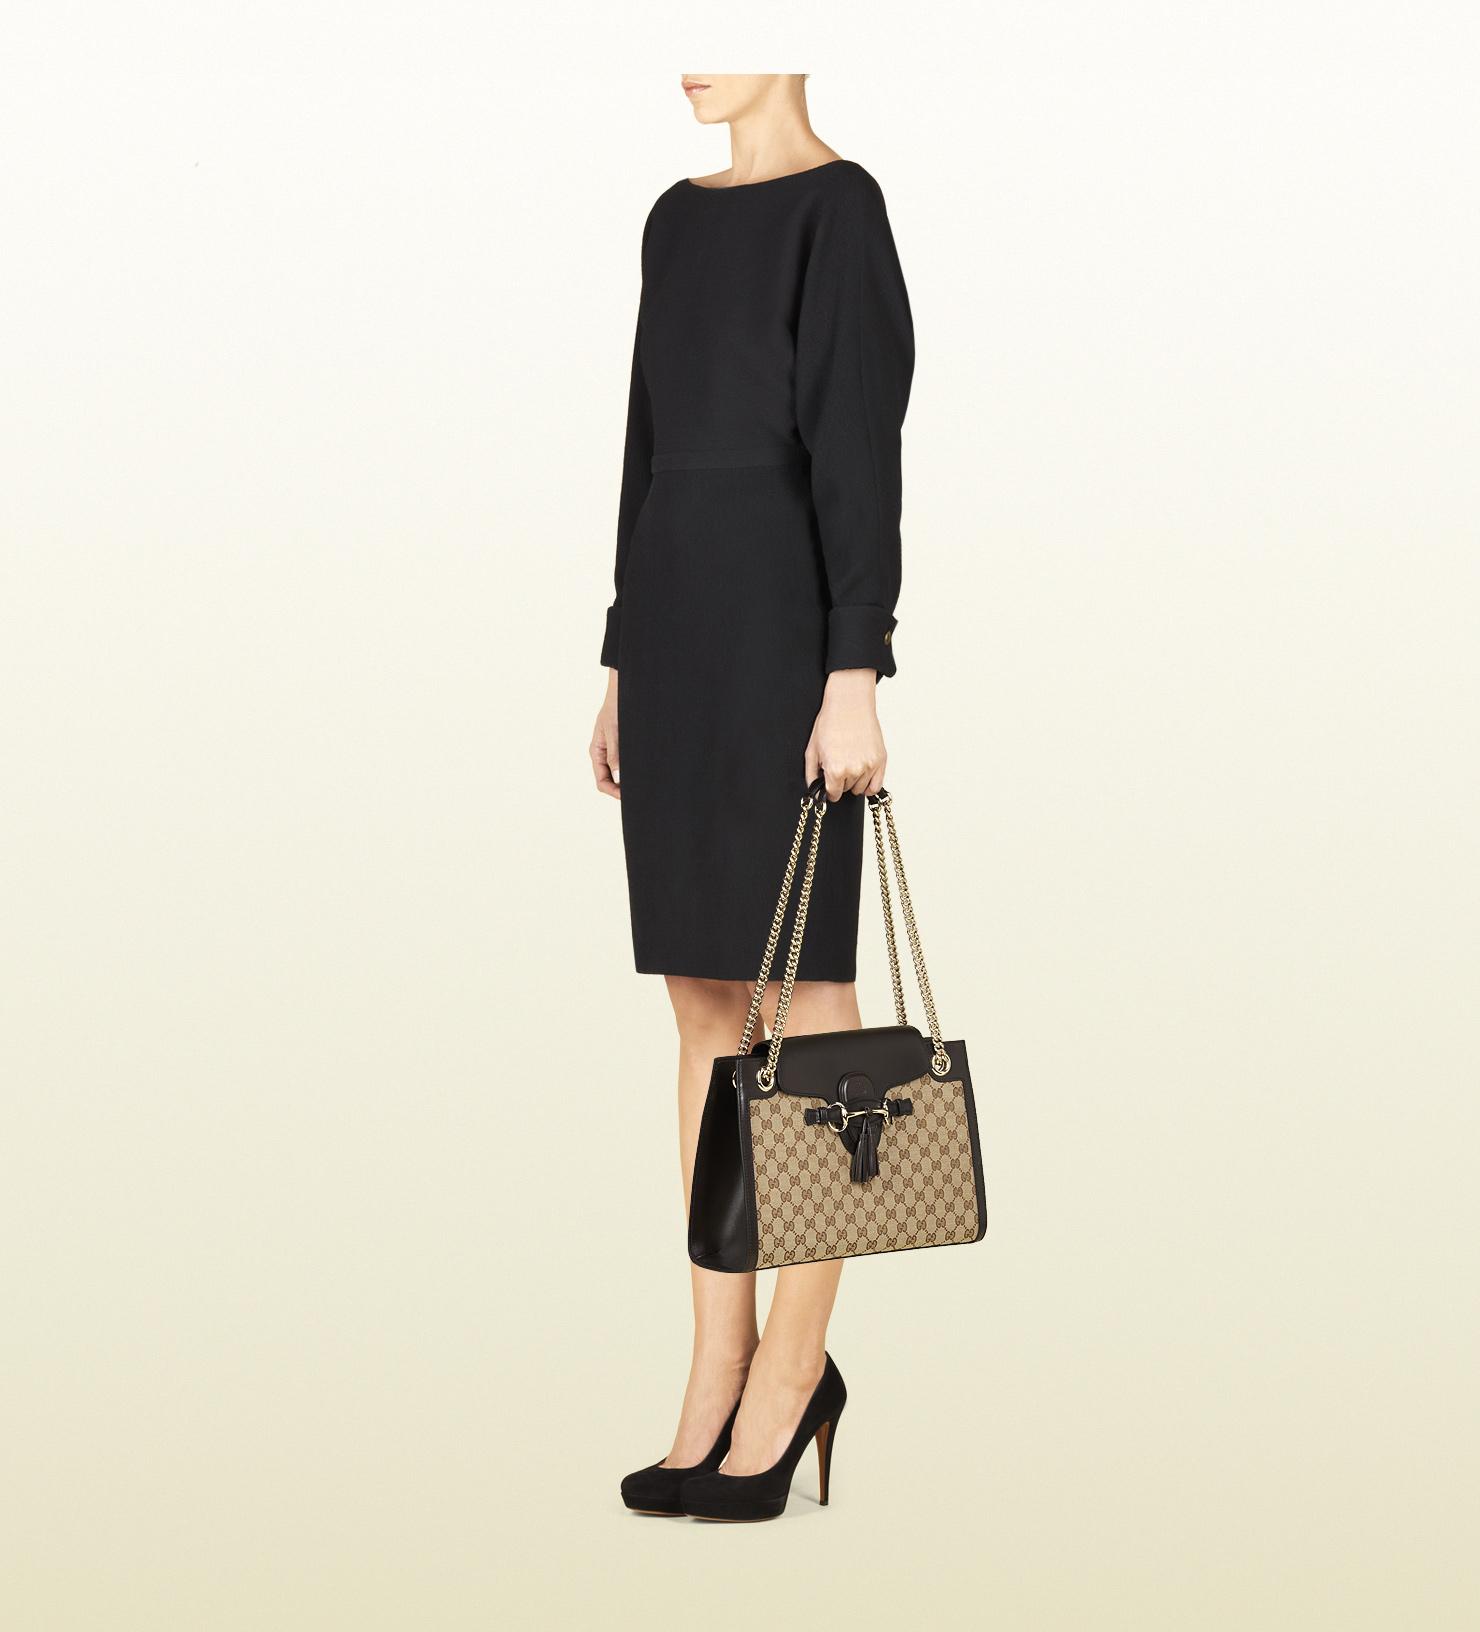 c8857048ff43f Lyst - Gucci Emily Original Gg Canvas Chain Shoulder Bag in Brown for Men